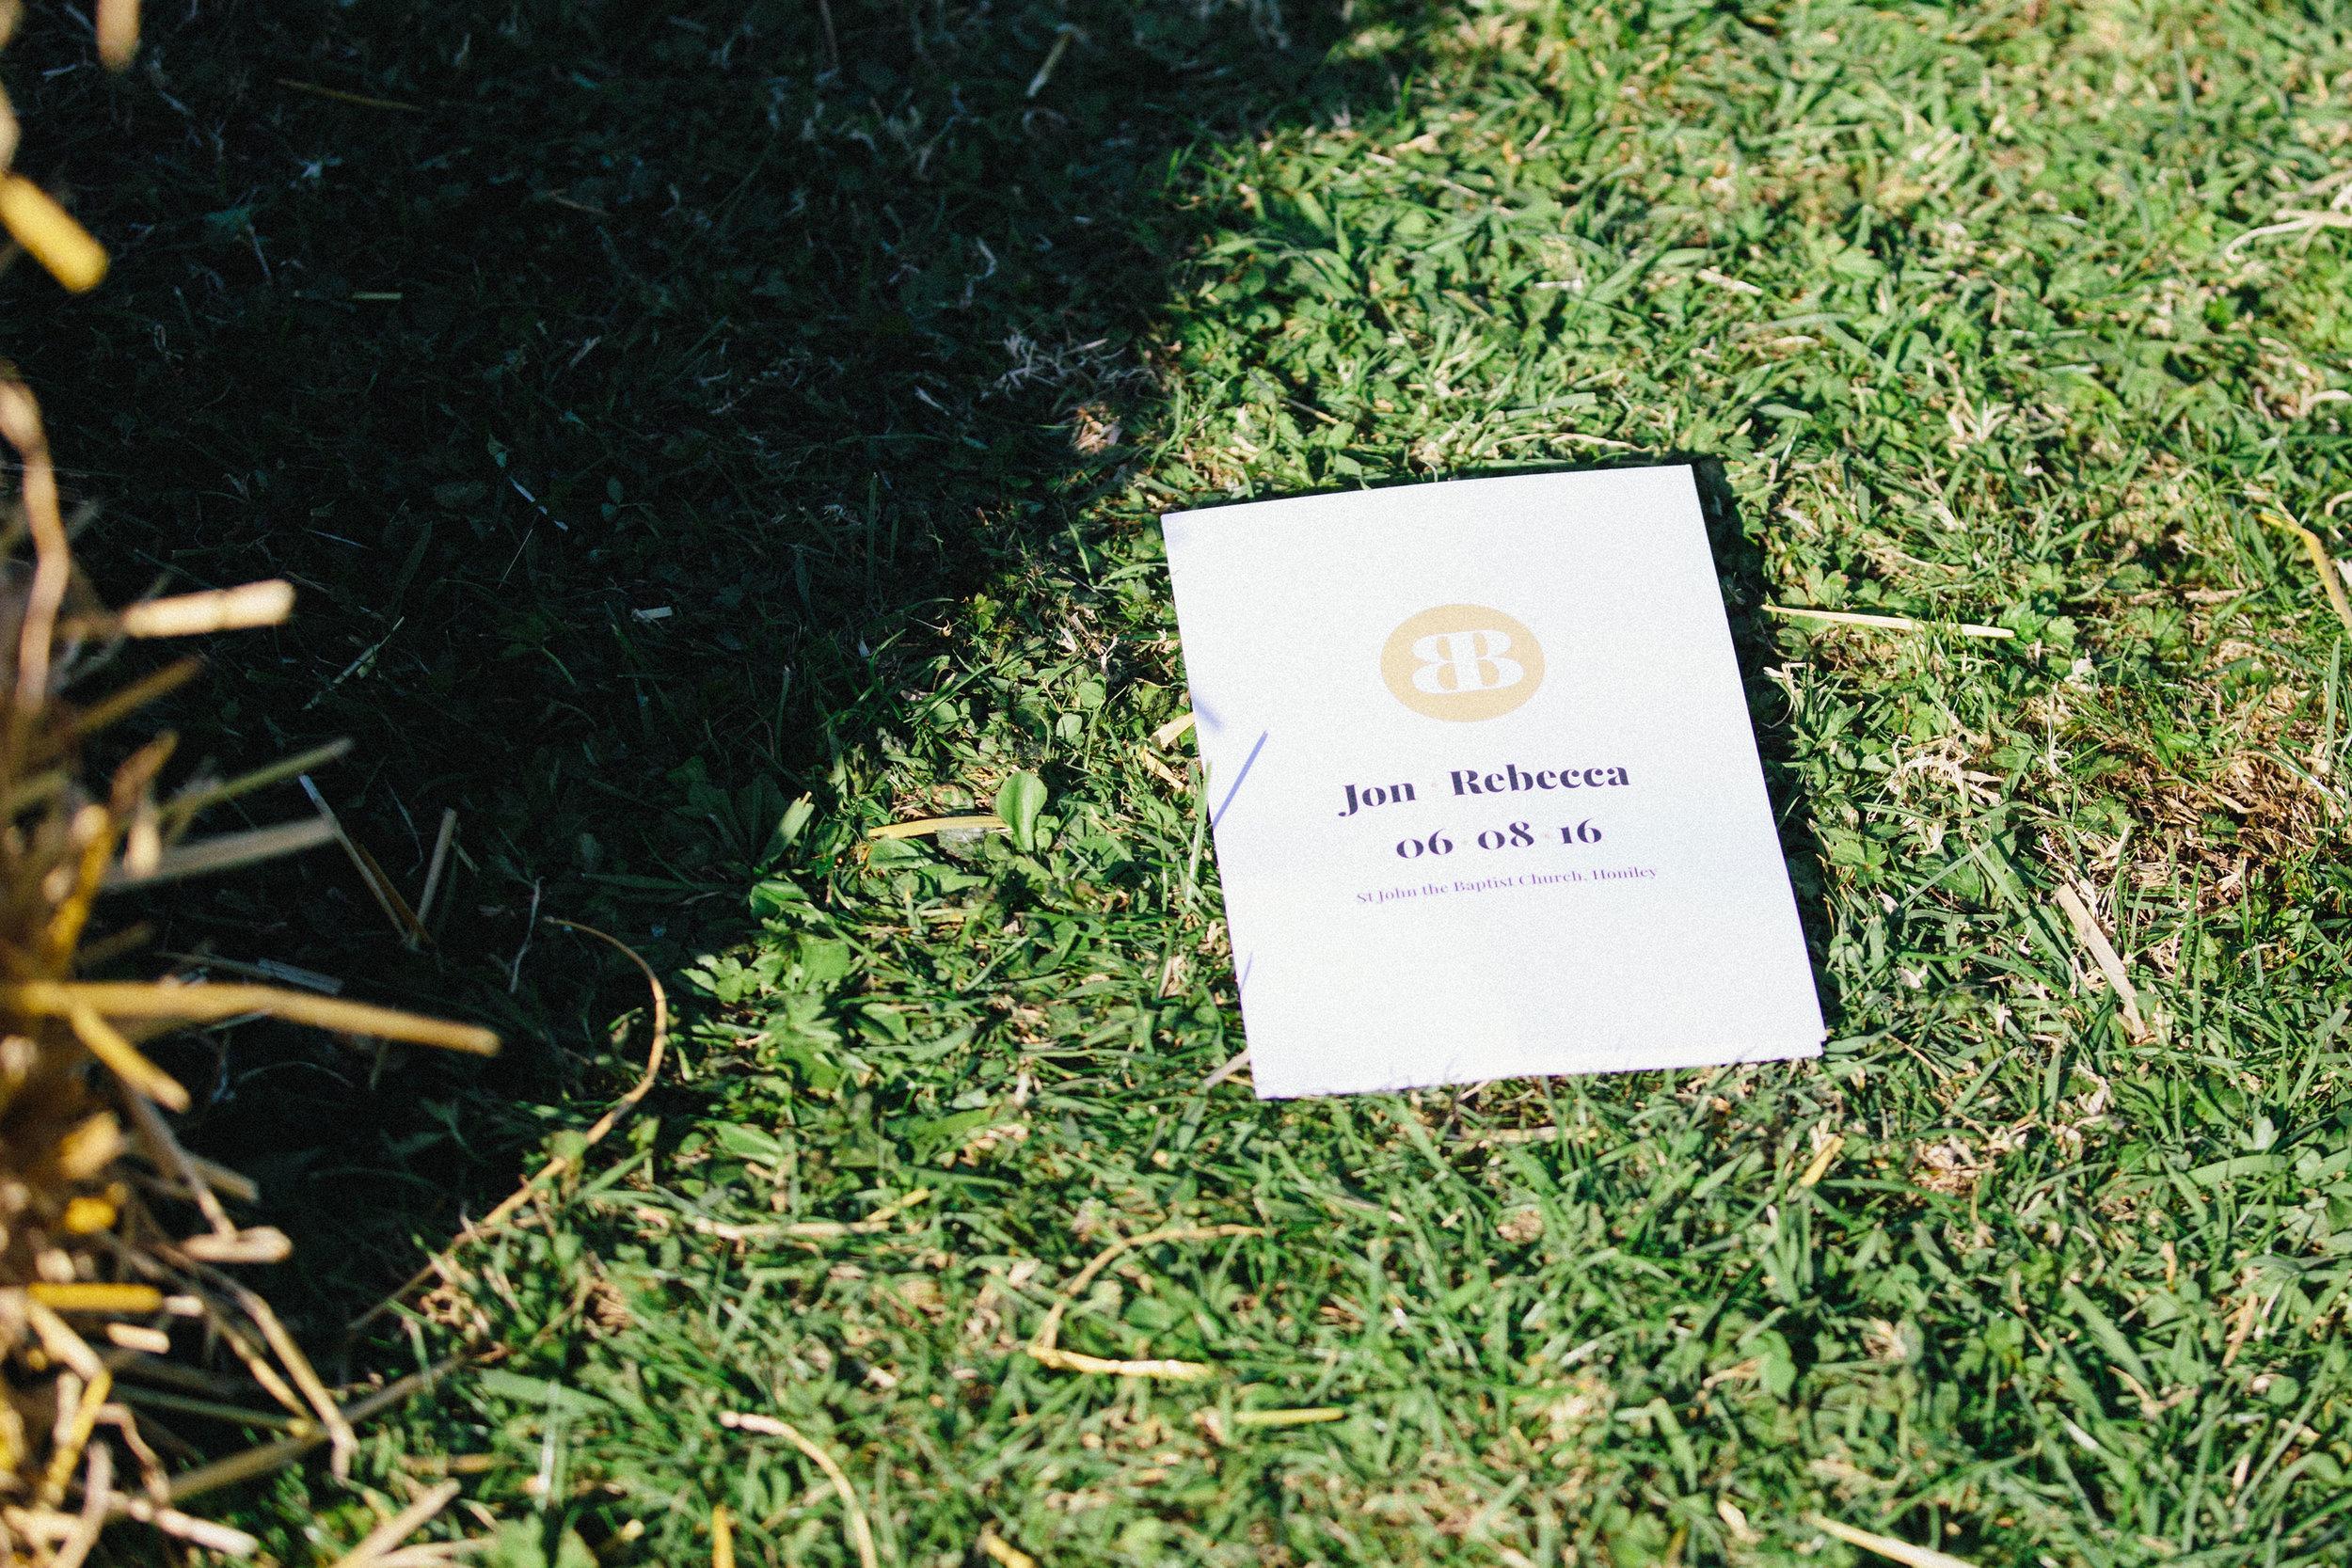 Becky-&-Jon---Aug16---Michael-Newington-Gray-379.jpg